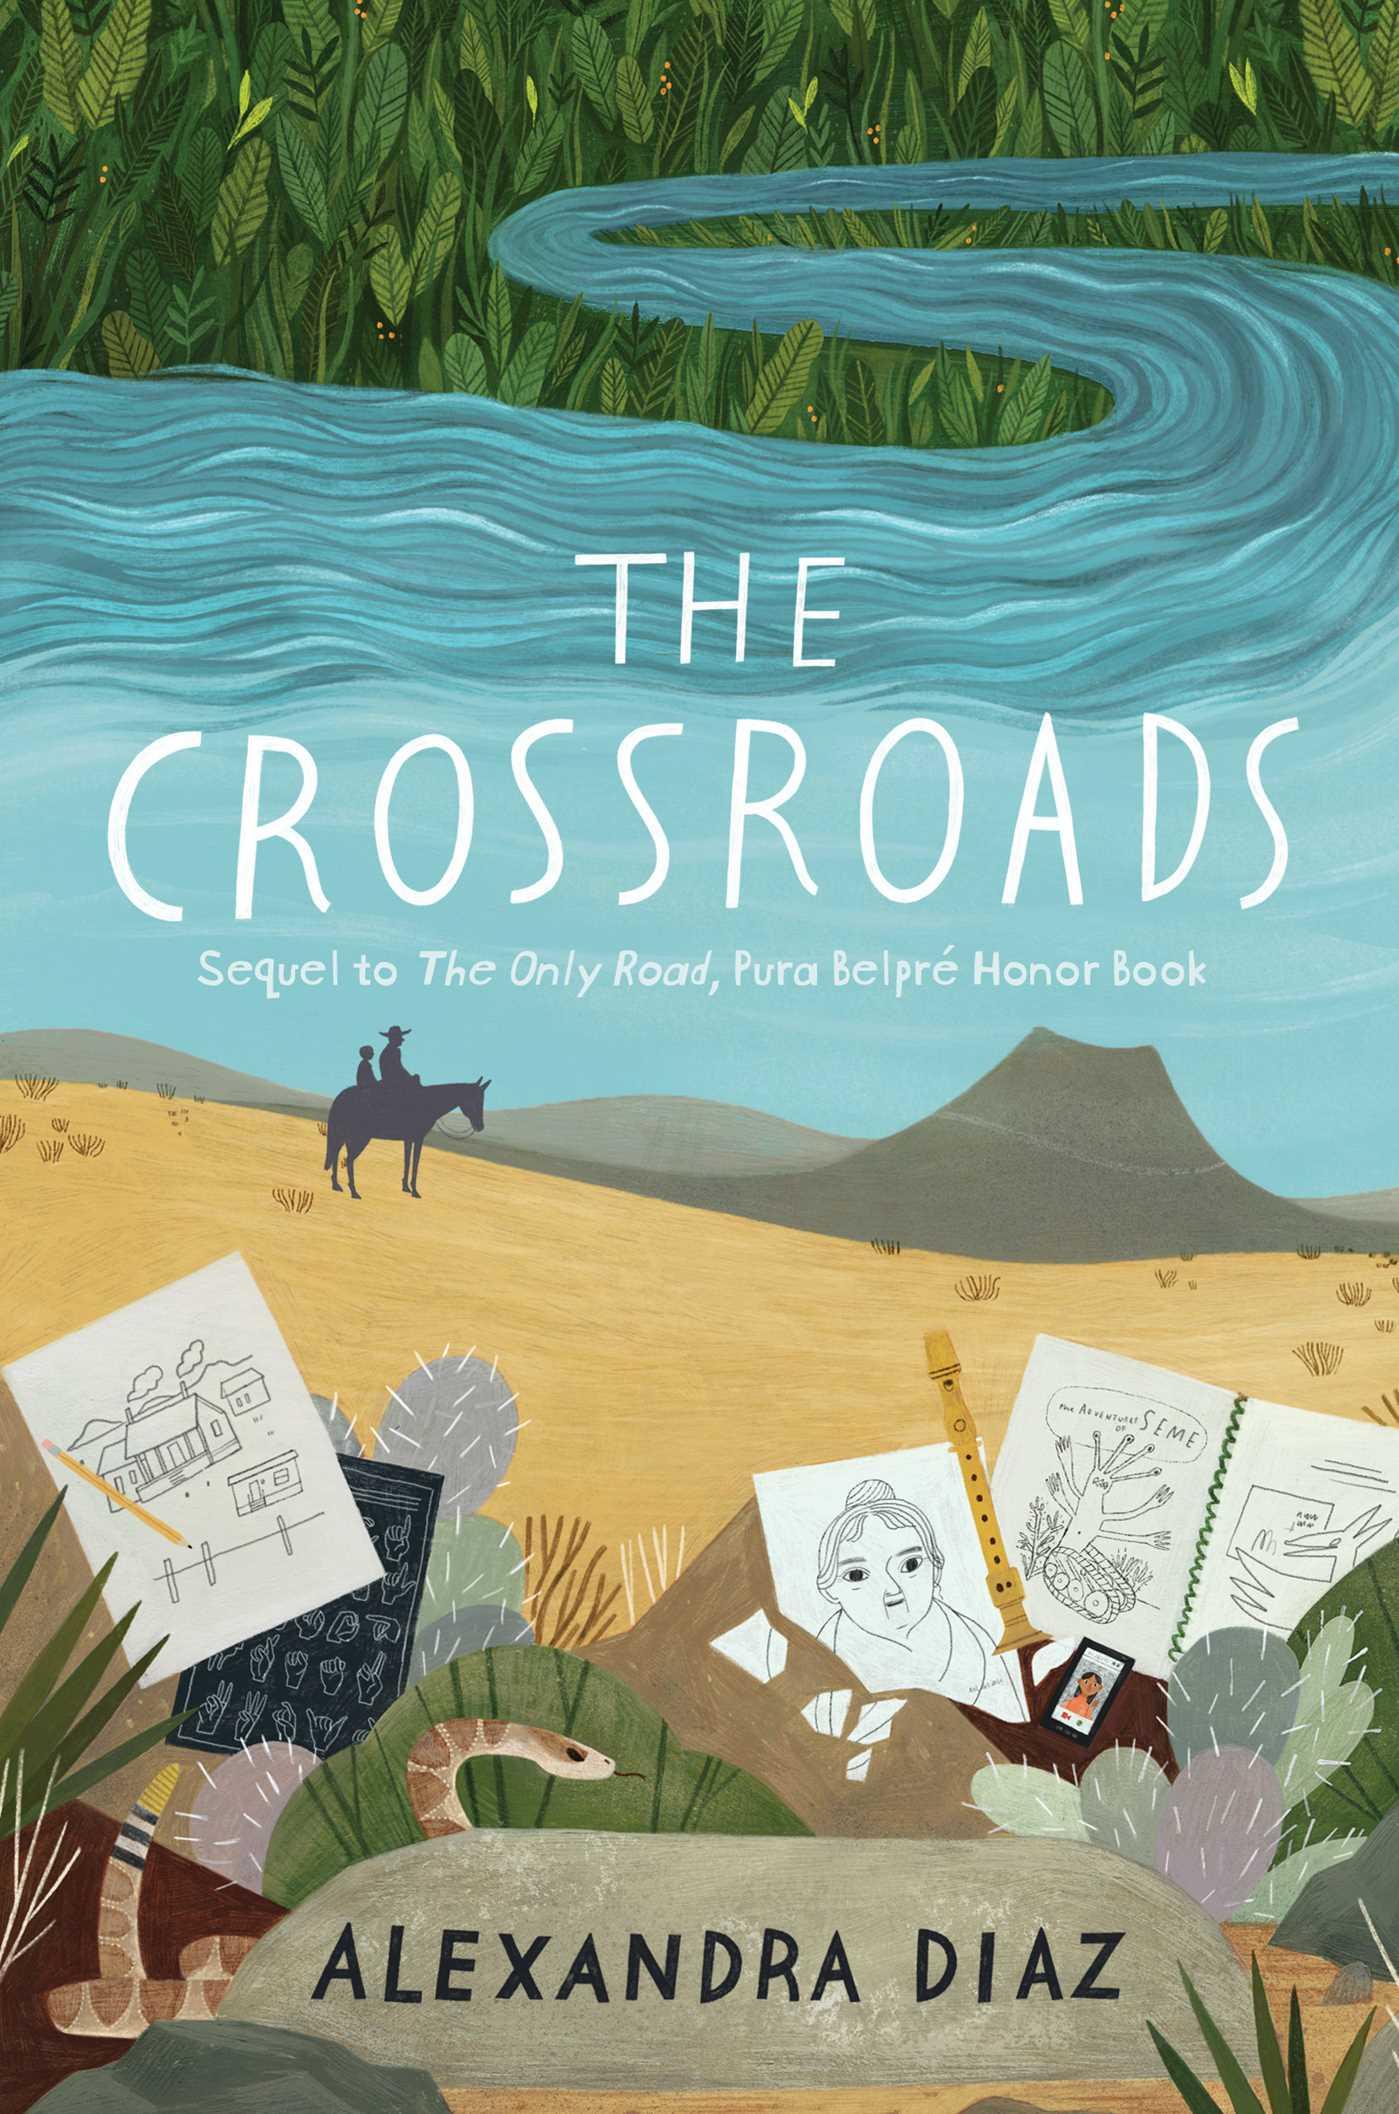 The crossroads 9781534414556 hr